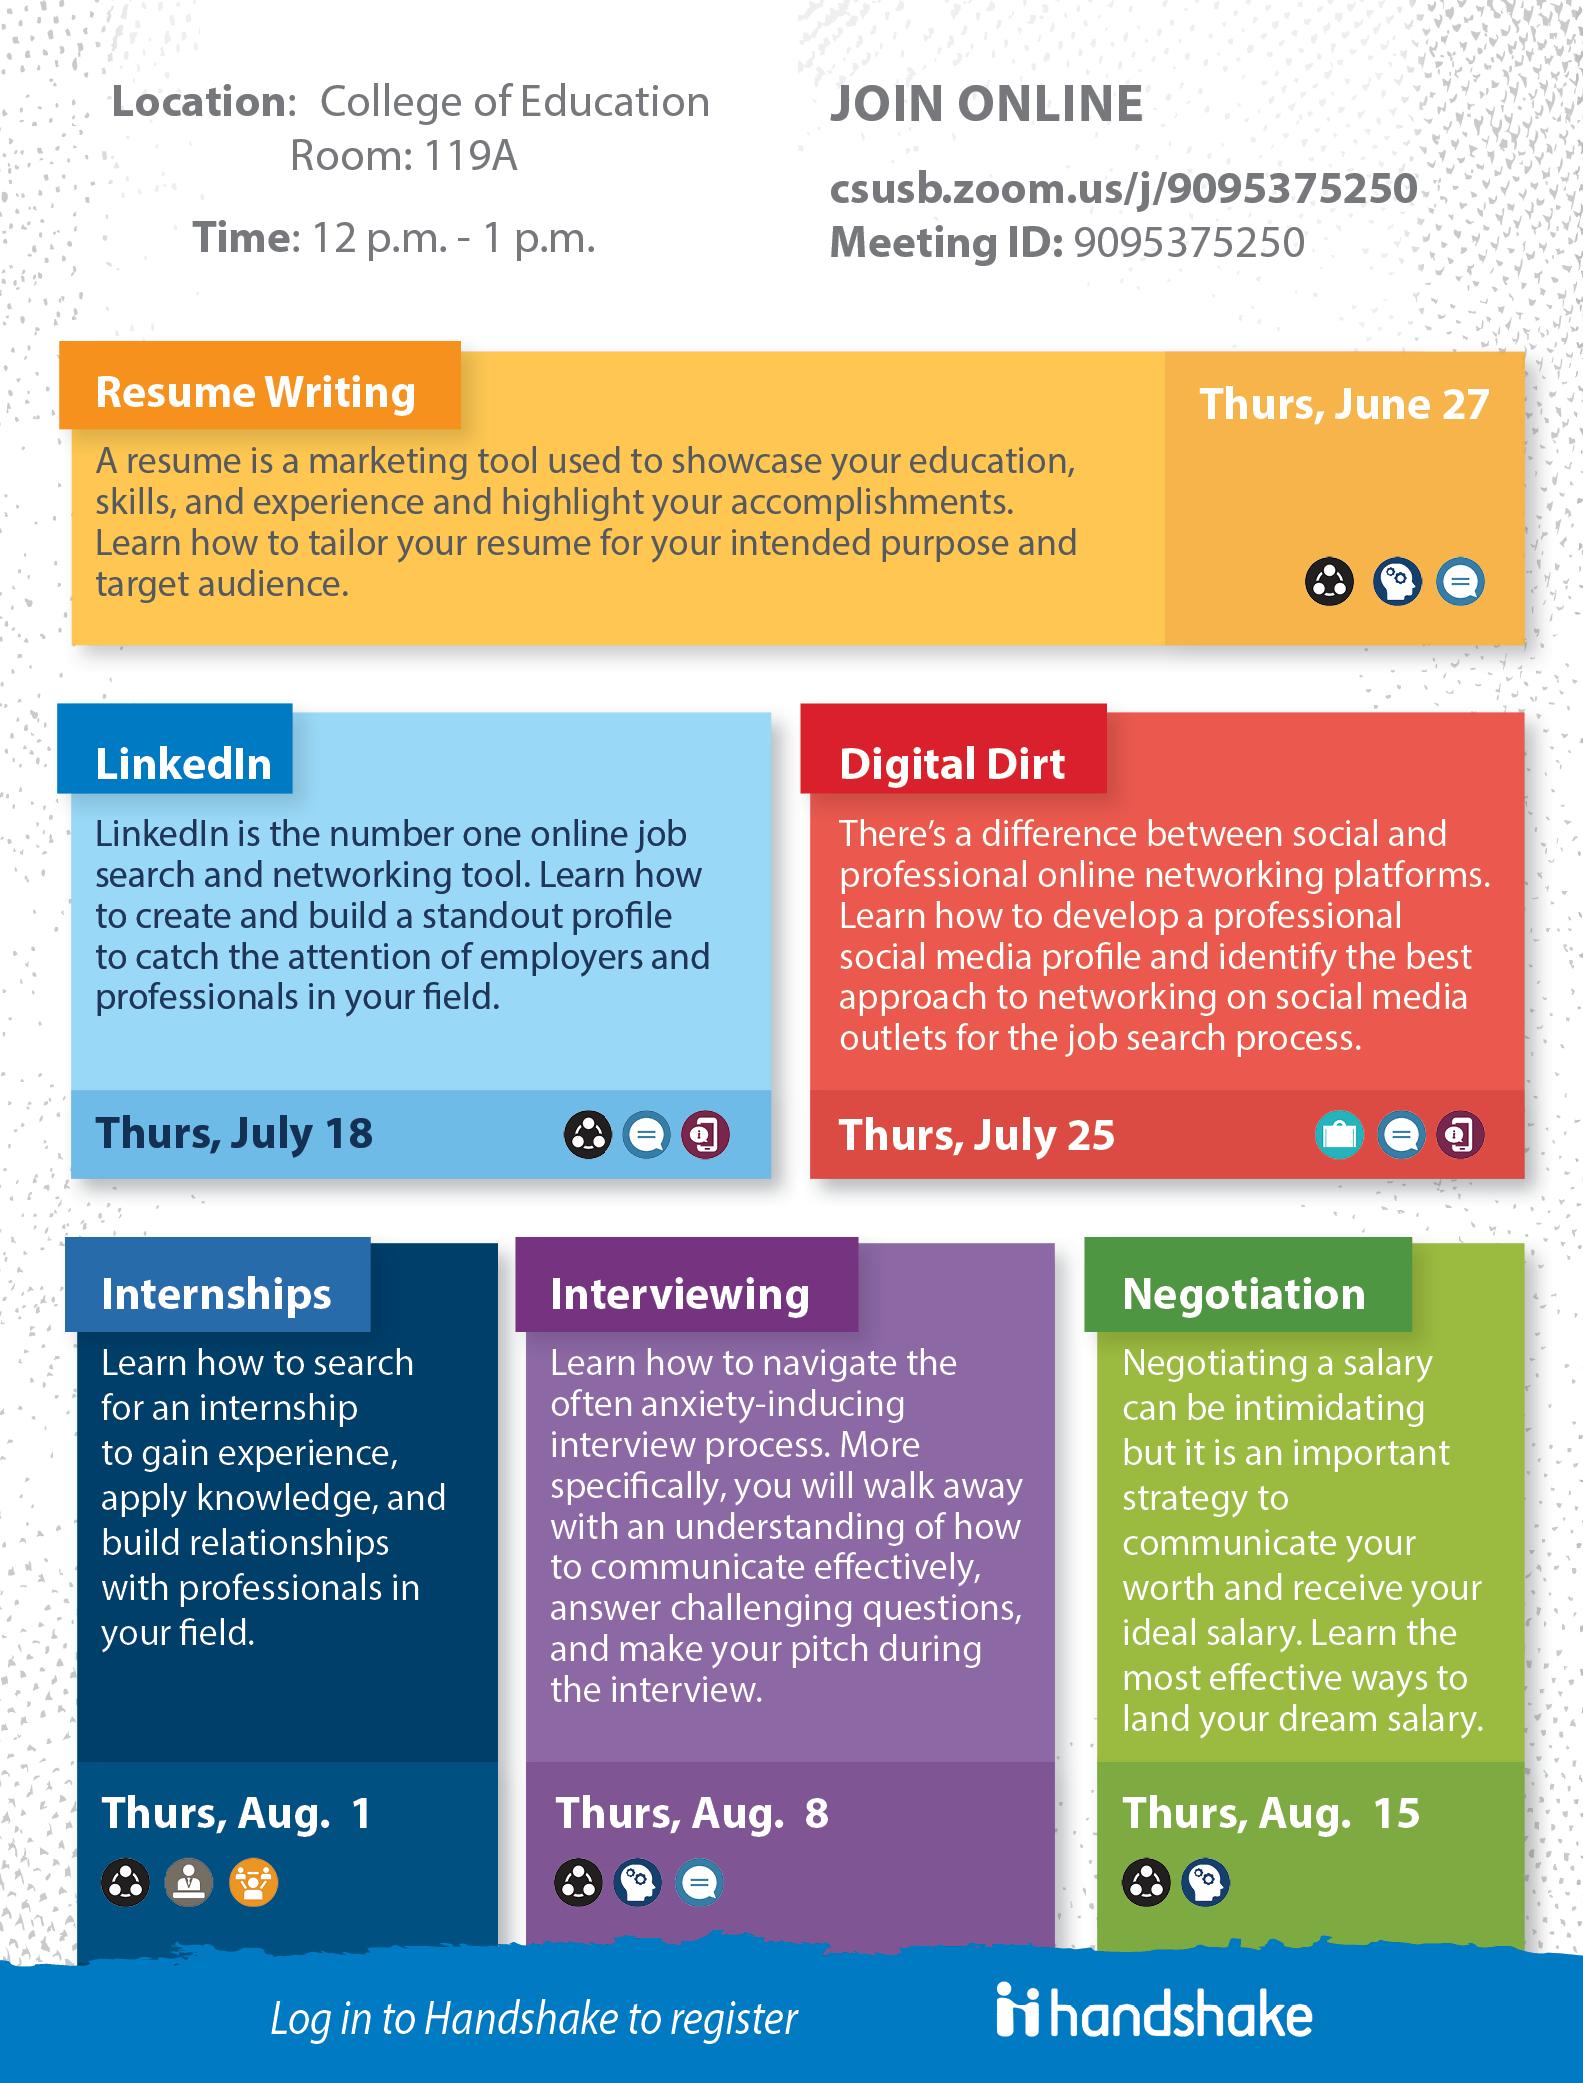 Summer 2019 Career Readiness Series